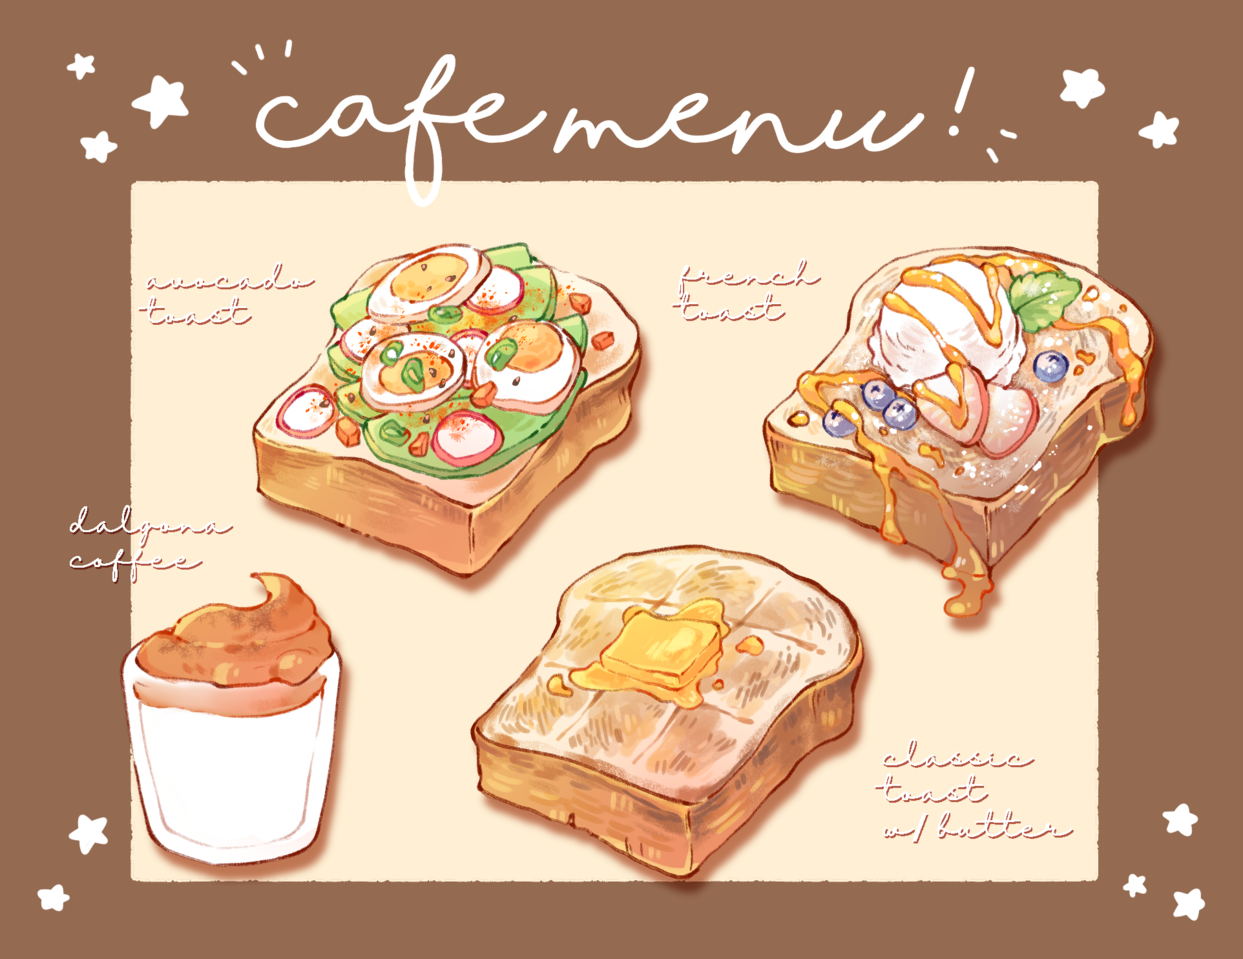 cafe menu! Illust of nata October2020_Contest:Food food medibangpaint bread coffee digital foodillustrations menu cafe